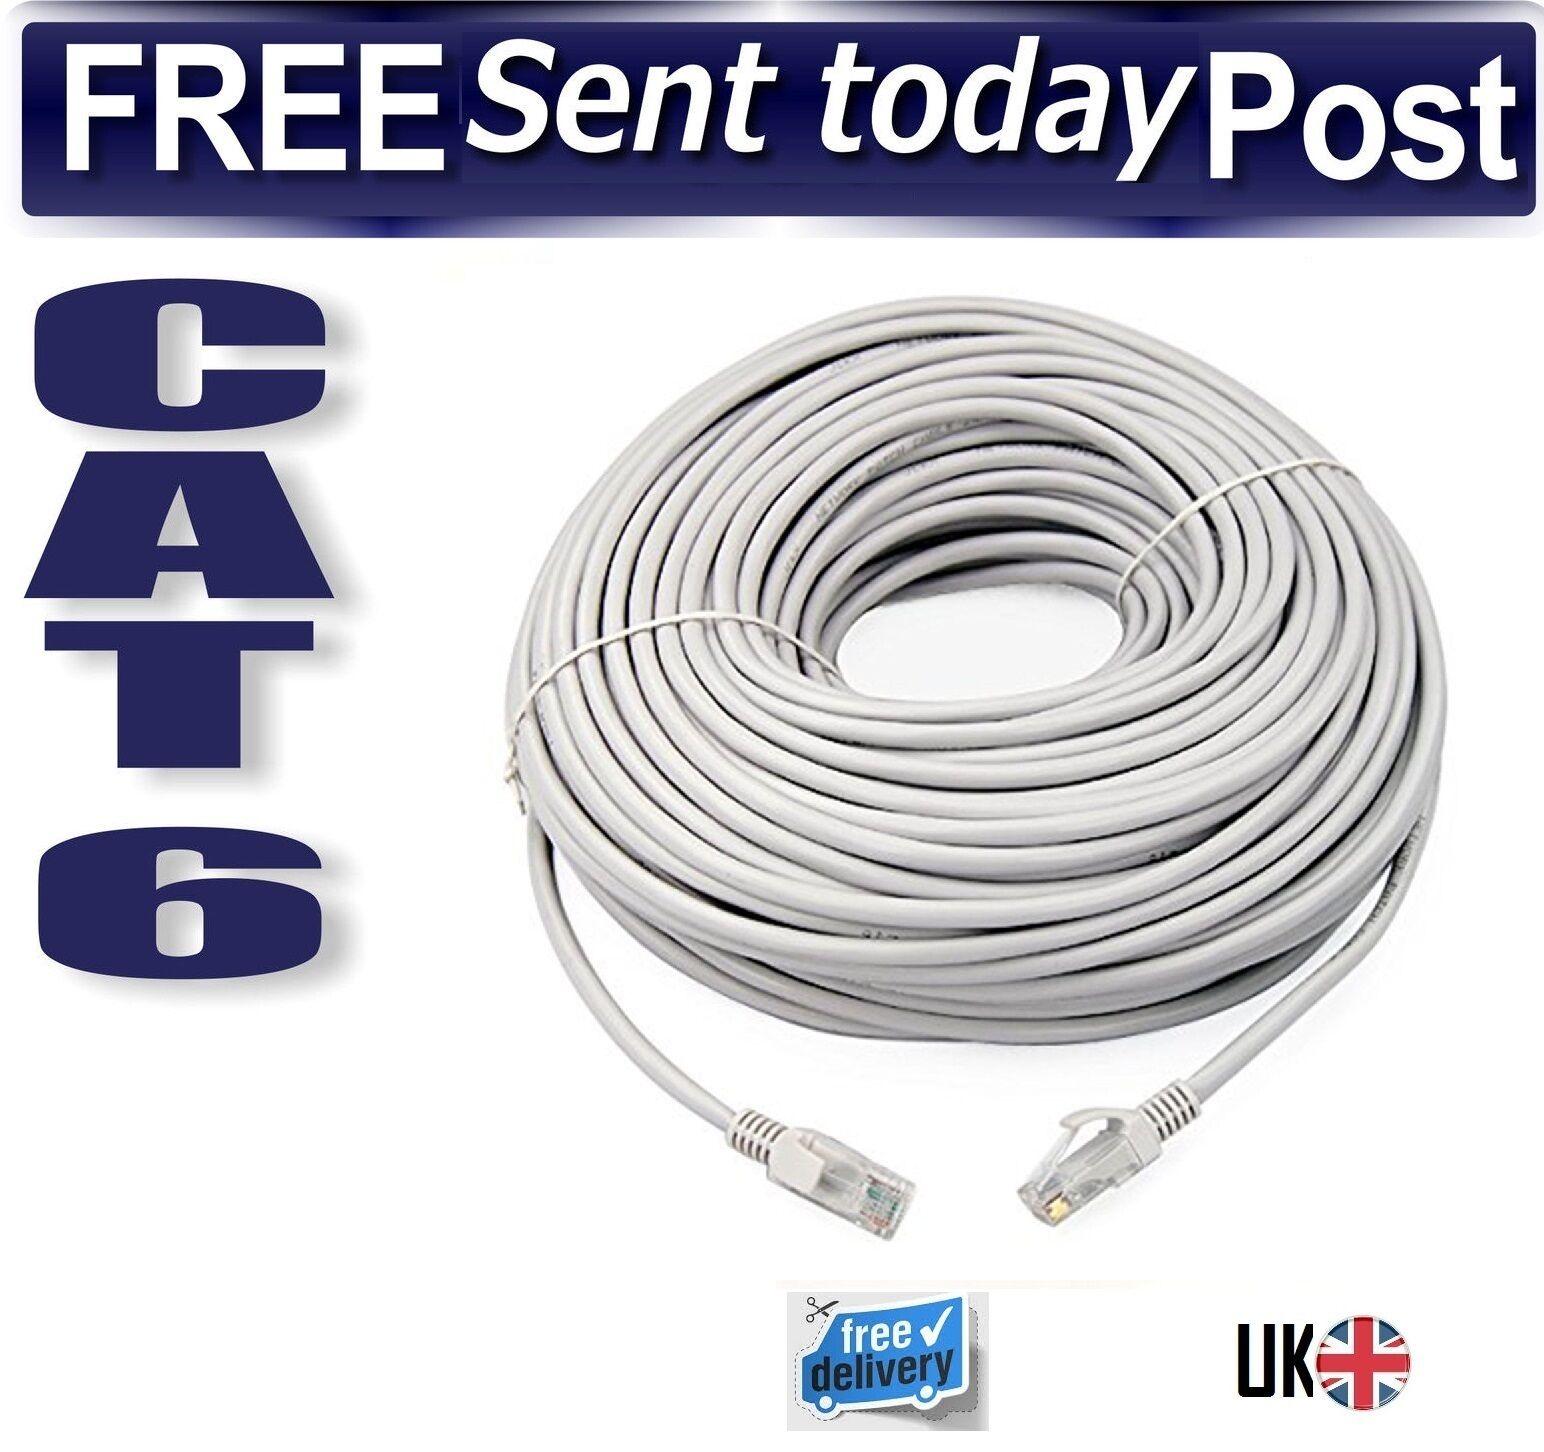 10X Ethernet Cable Cat6 Network LAN RJ45 Internet Patch UTP Cord Modem Wire Lot